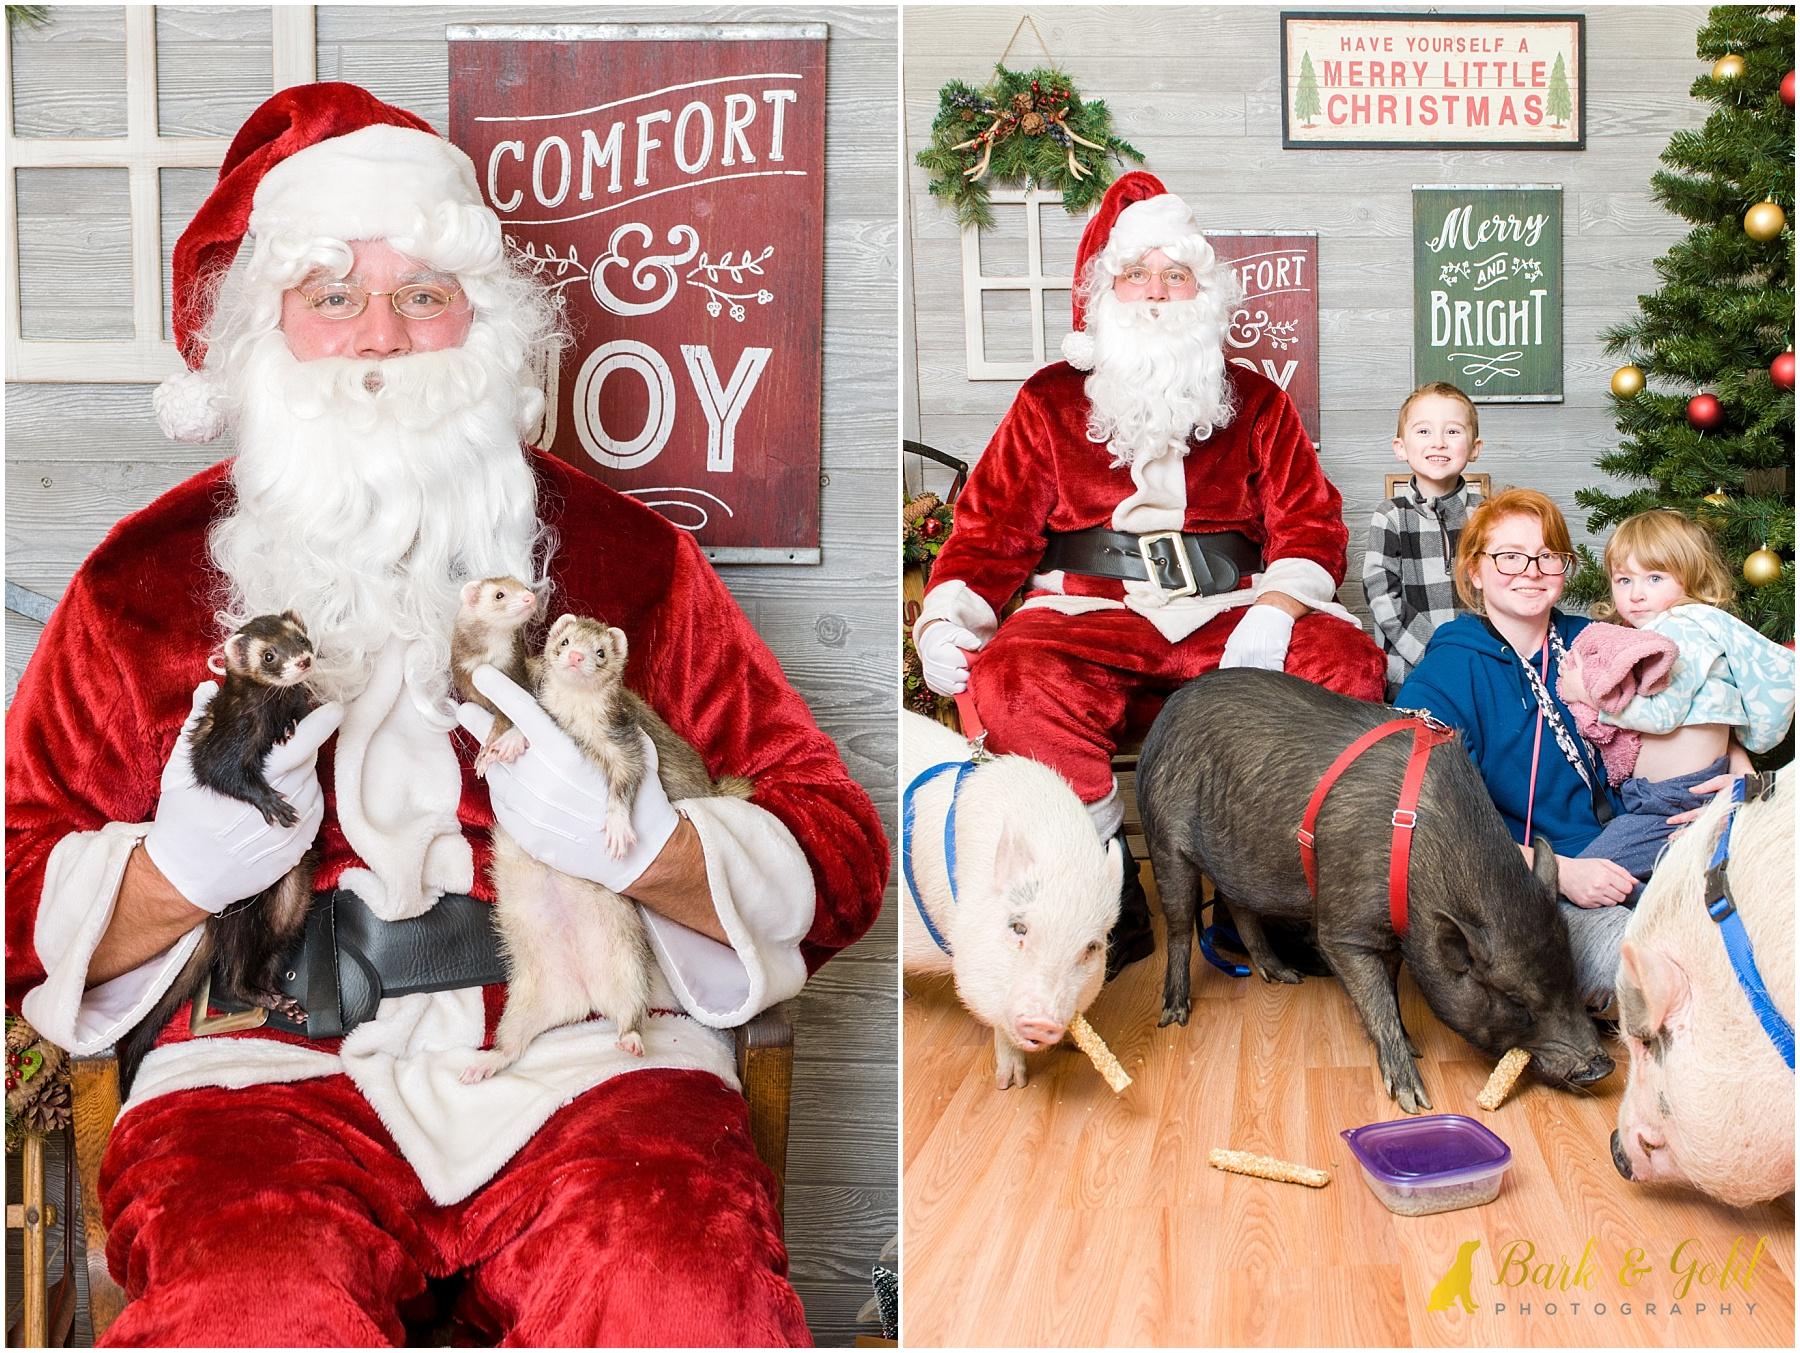 ferrets and pot-bellied pigs meeting Santa during 2017 pet photos with Santa at Petagogy